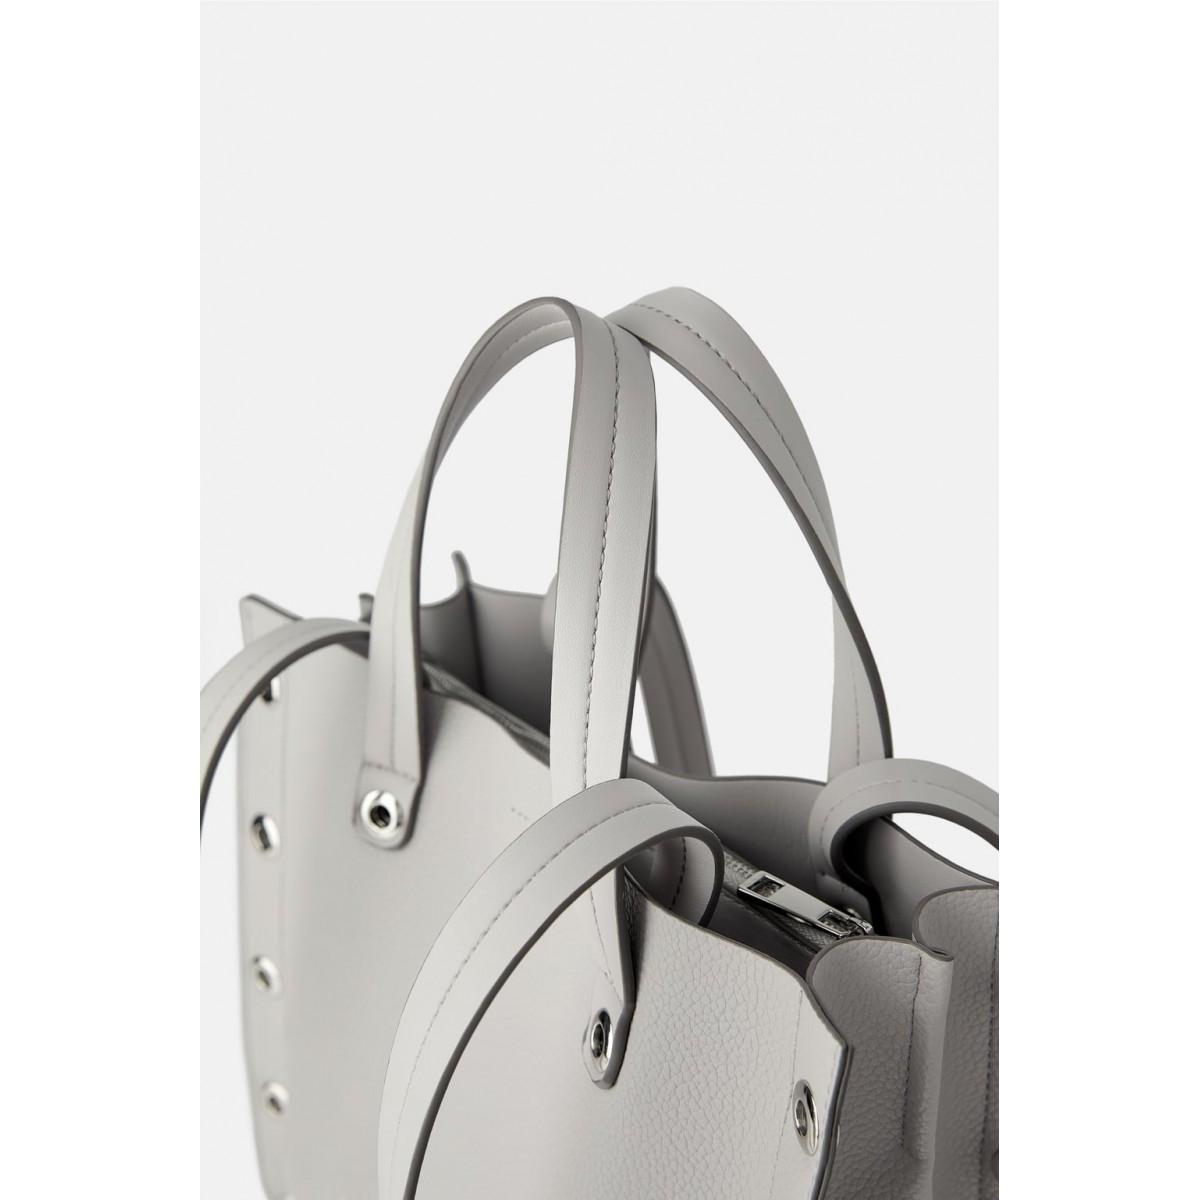 Zara Square Tote Bag with Eyelets